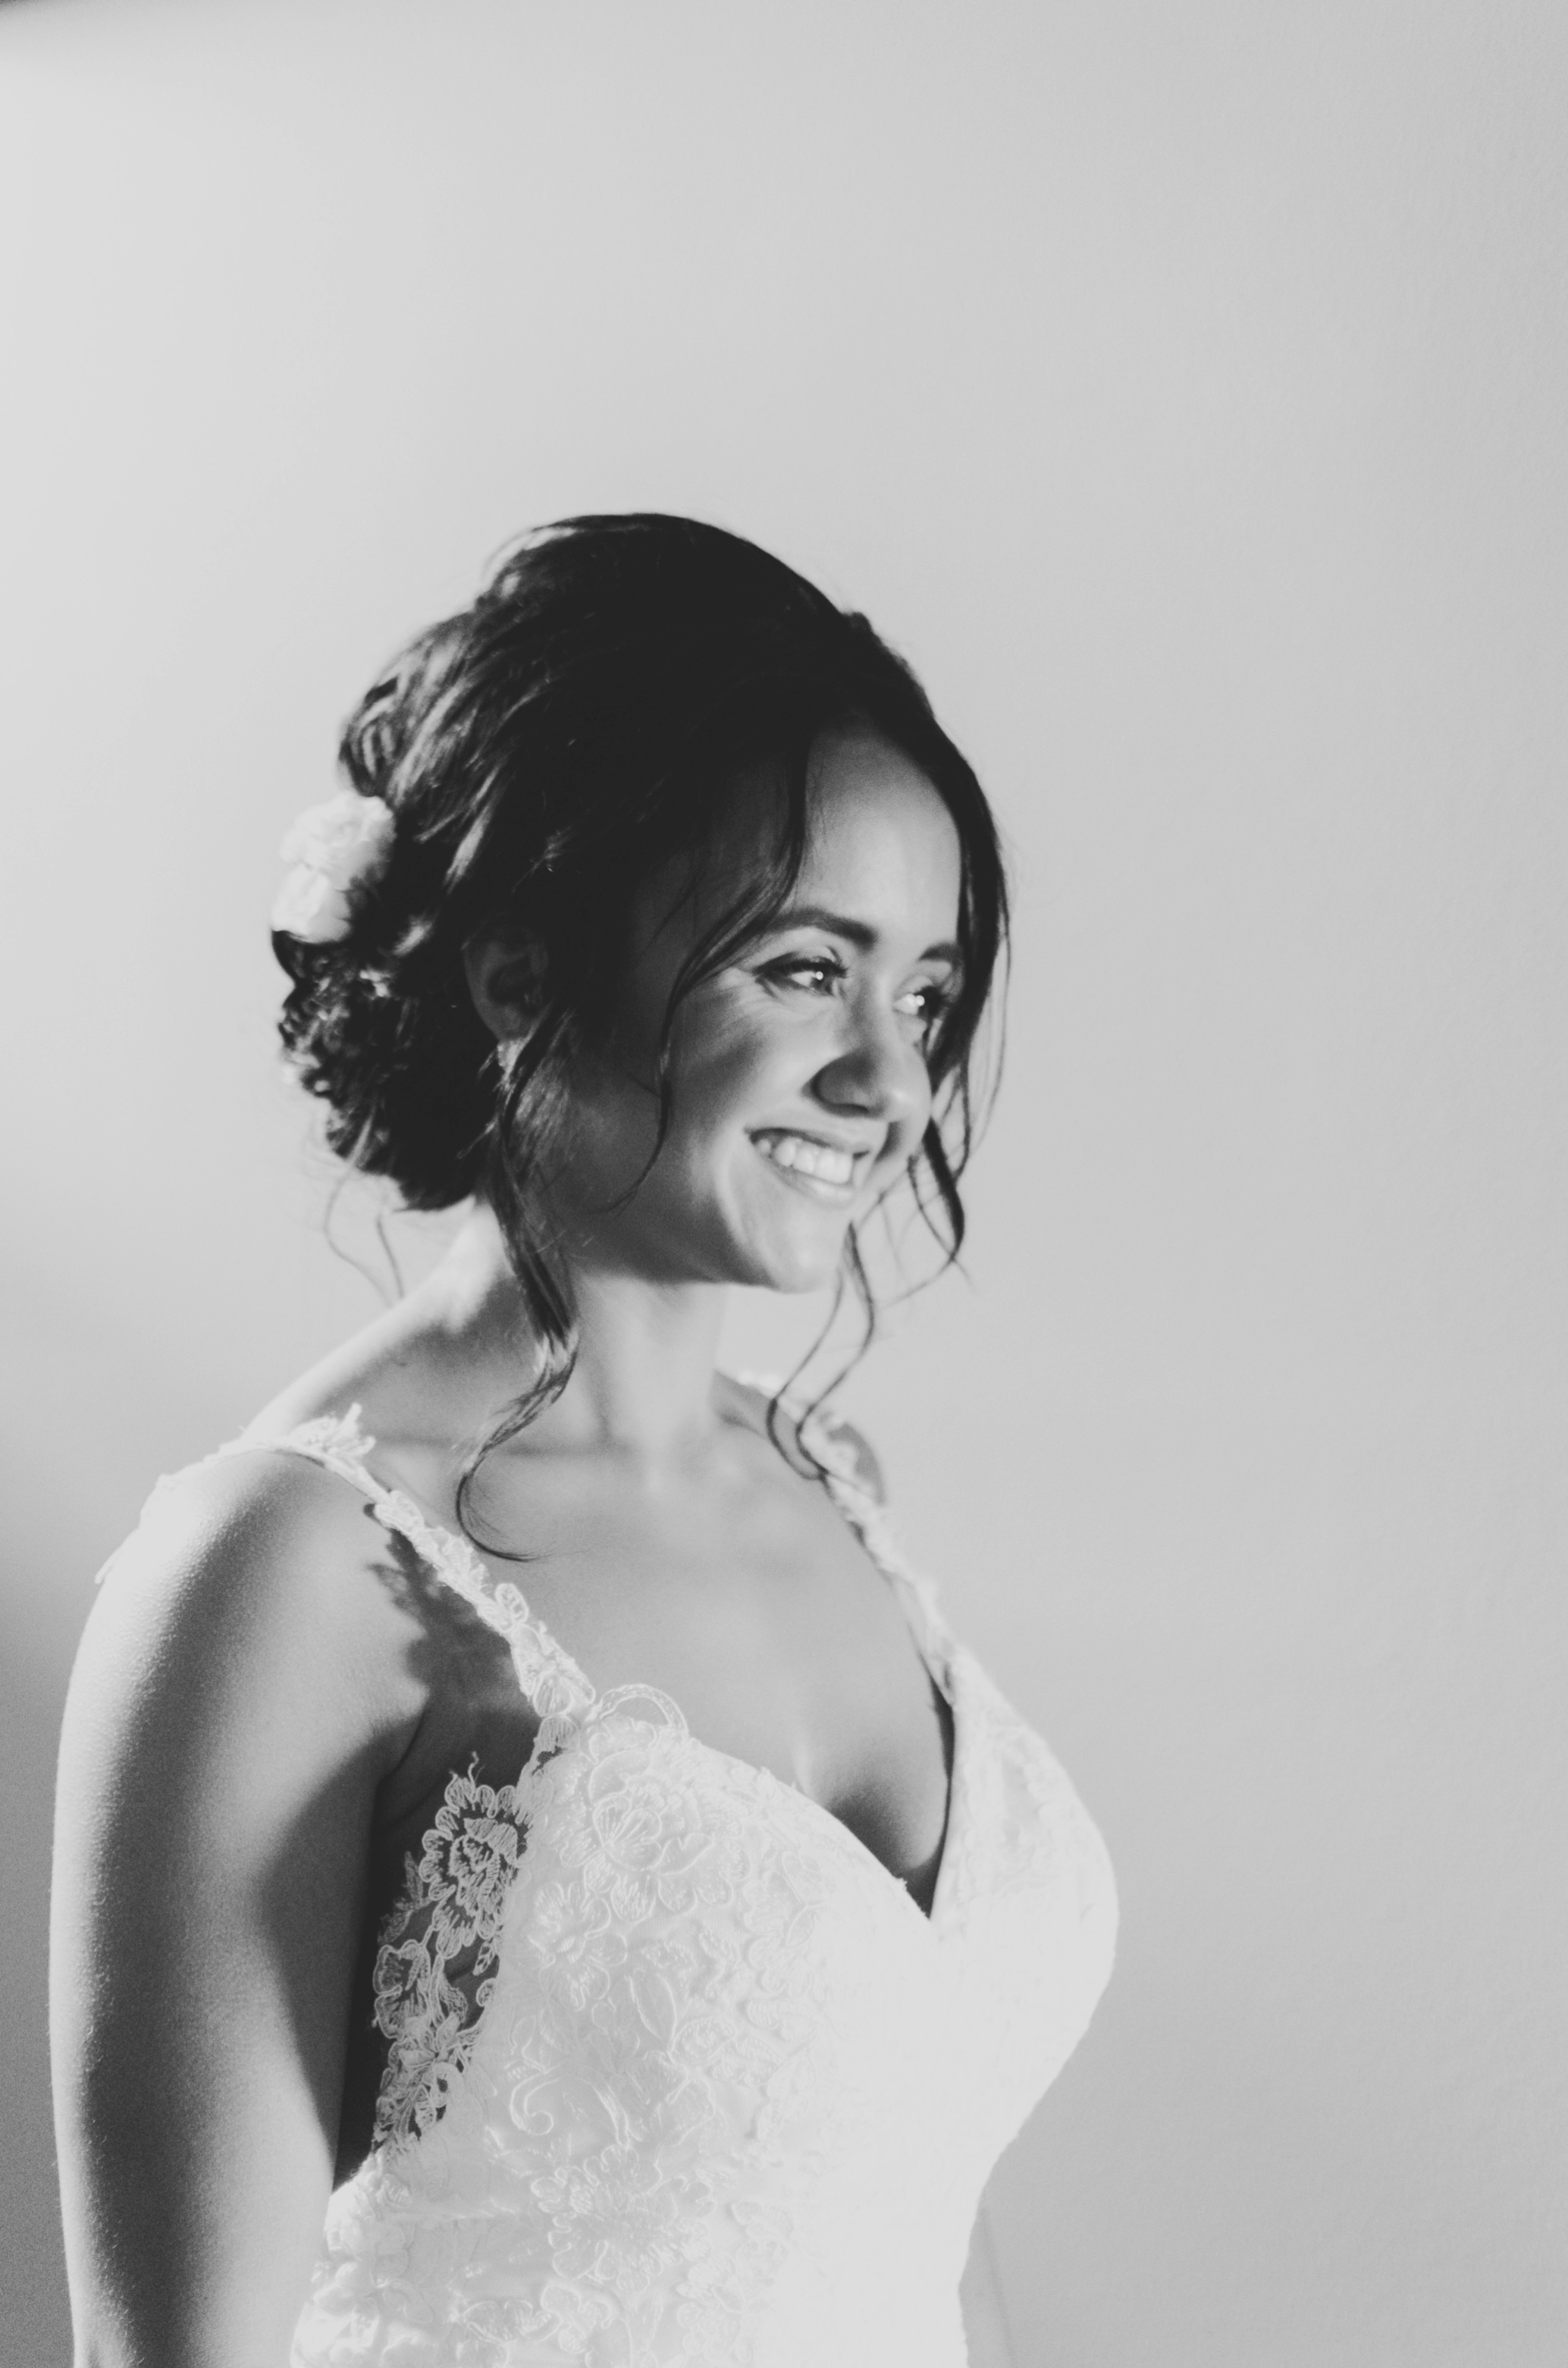 Barnes' Place Rustic Outdoor Wedding | Ali Leigh Photo Minneapolis Wedding Photographer_0098.jpg